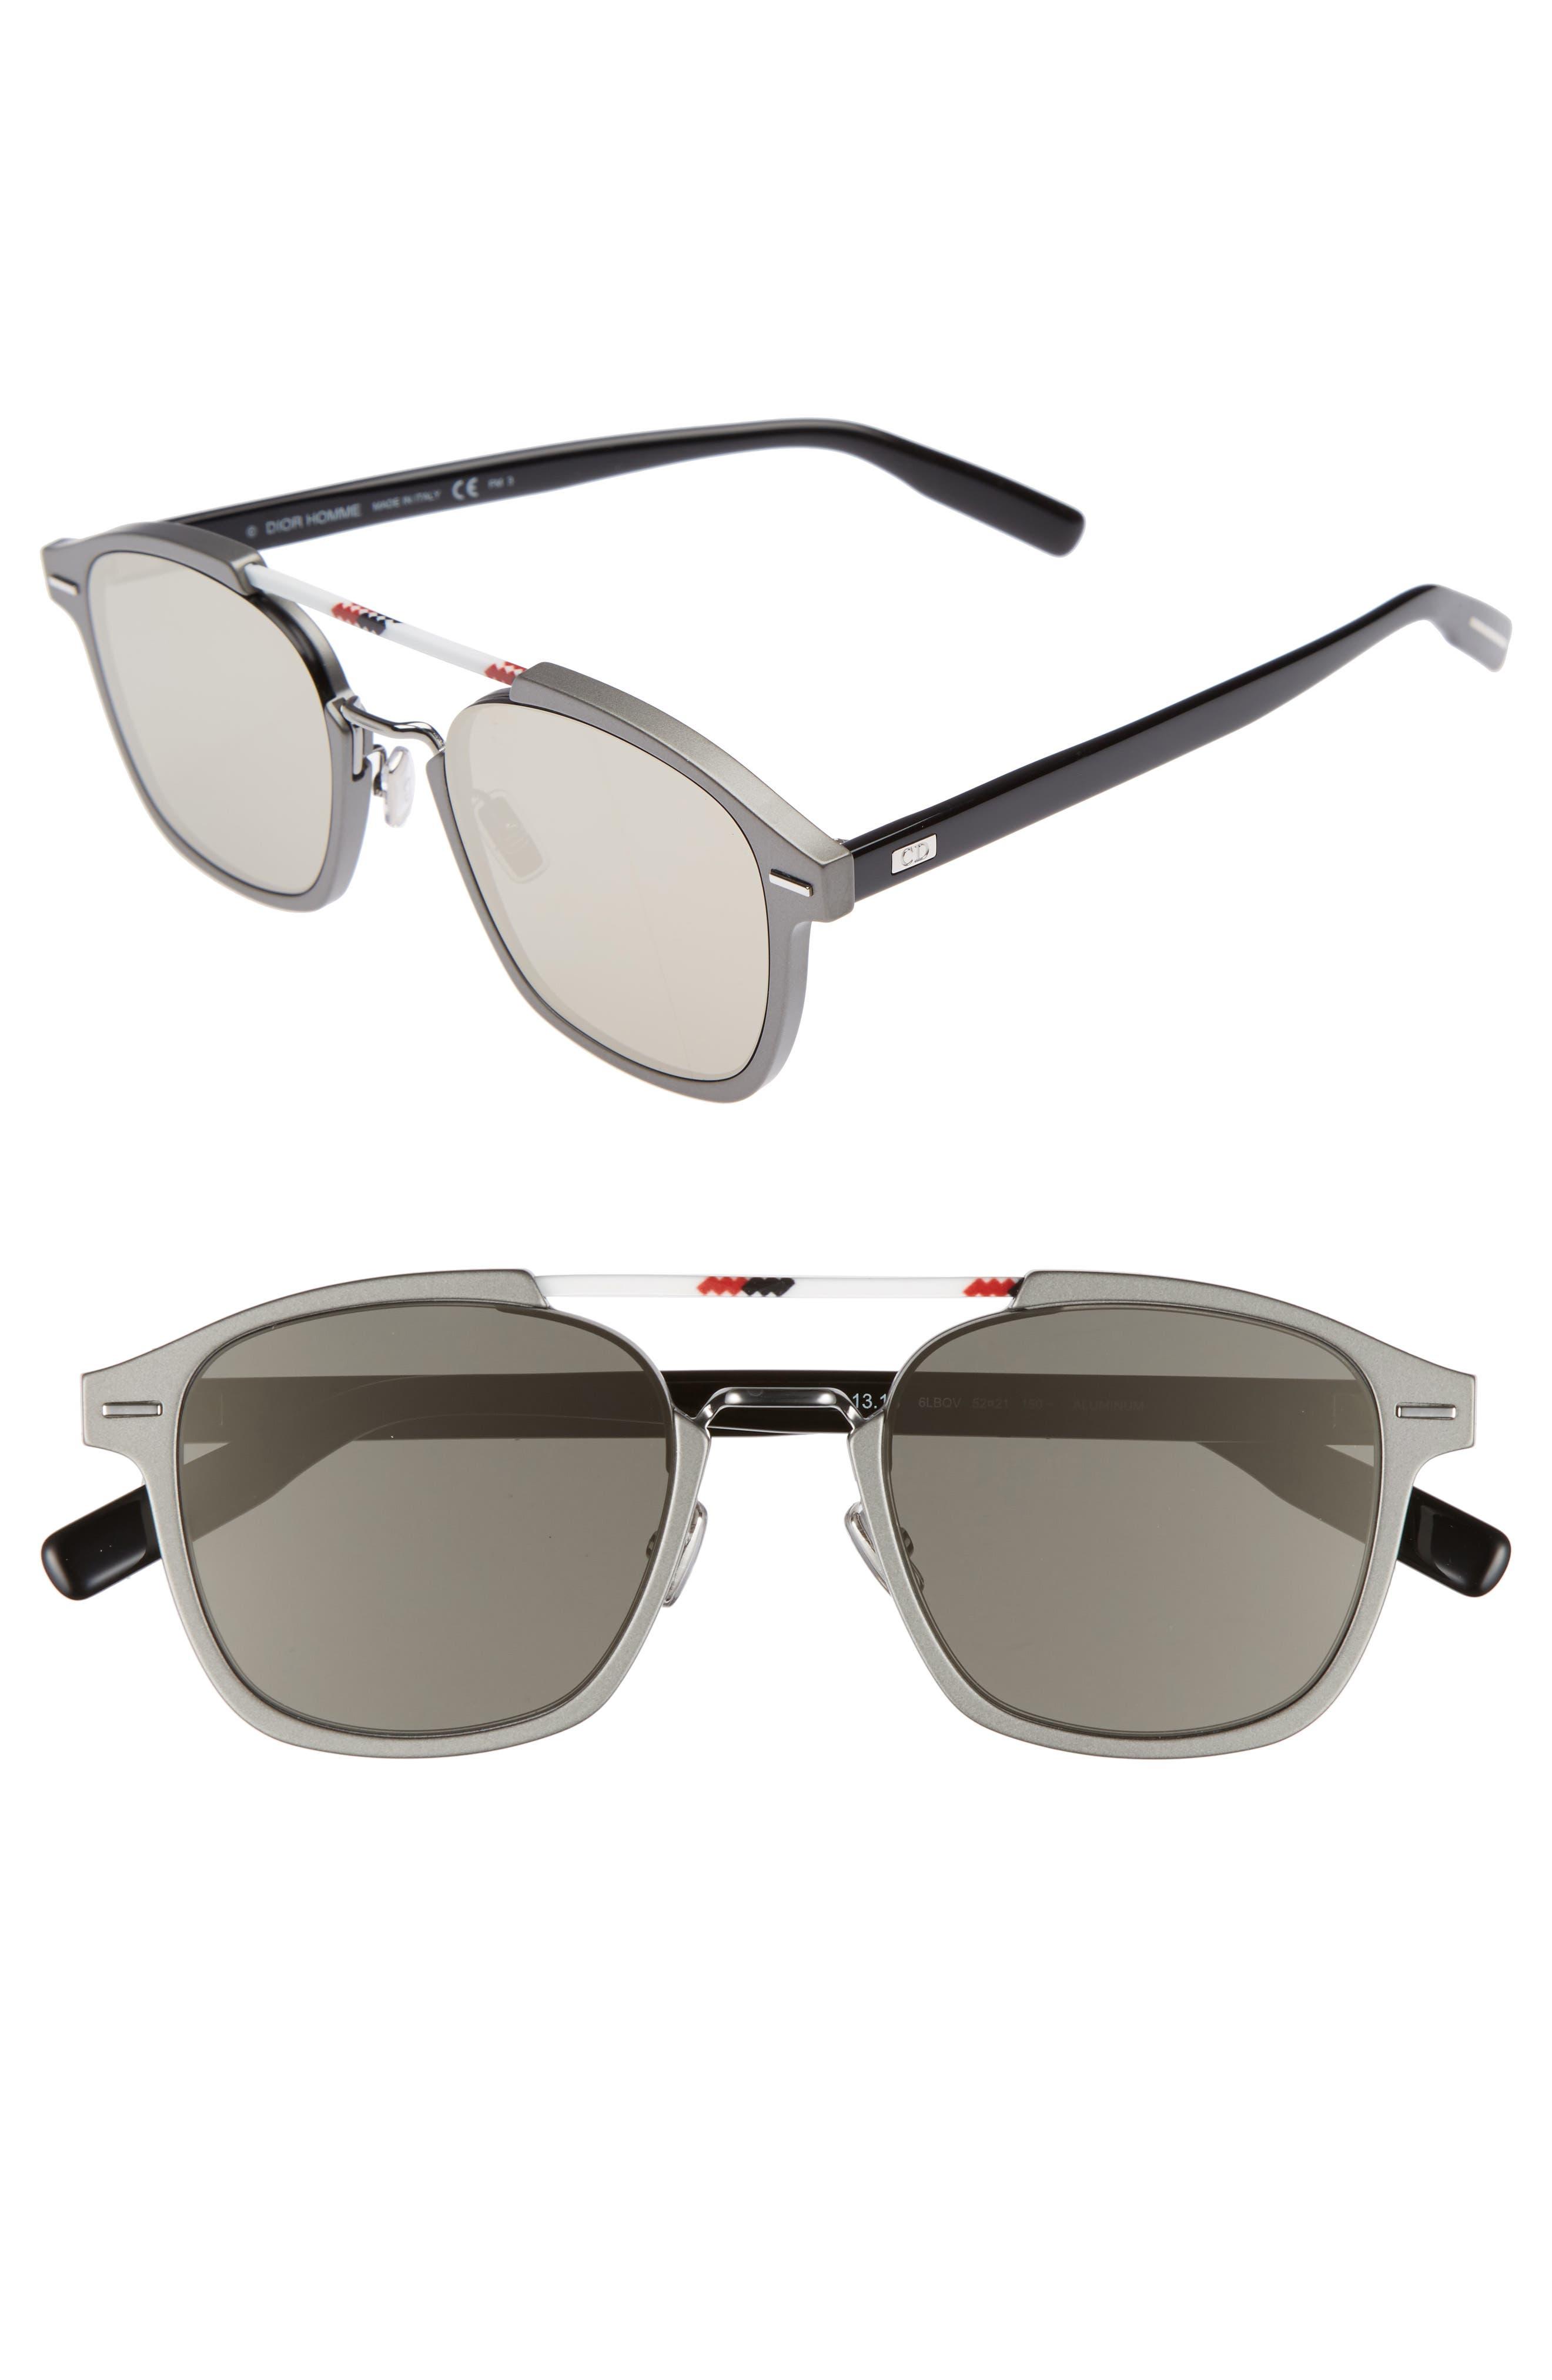 Main Image - Dior Homme AL13.13 52mm Sunglasses